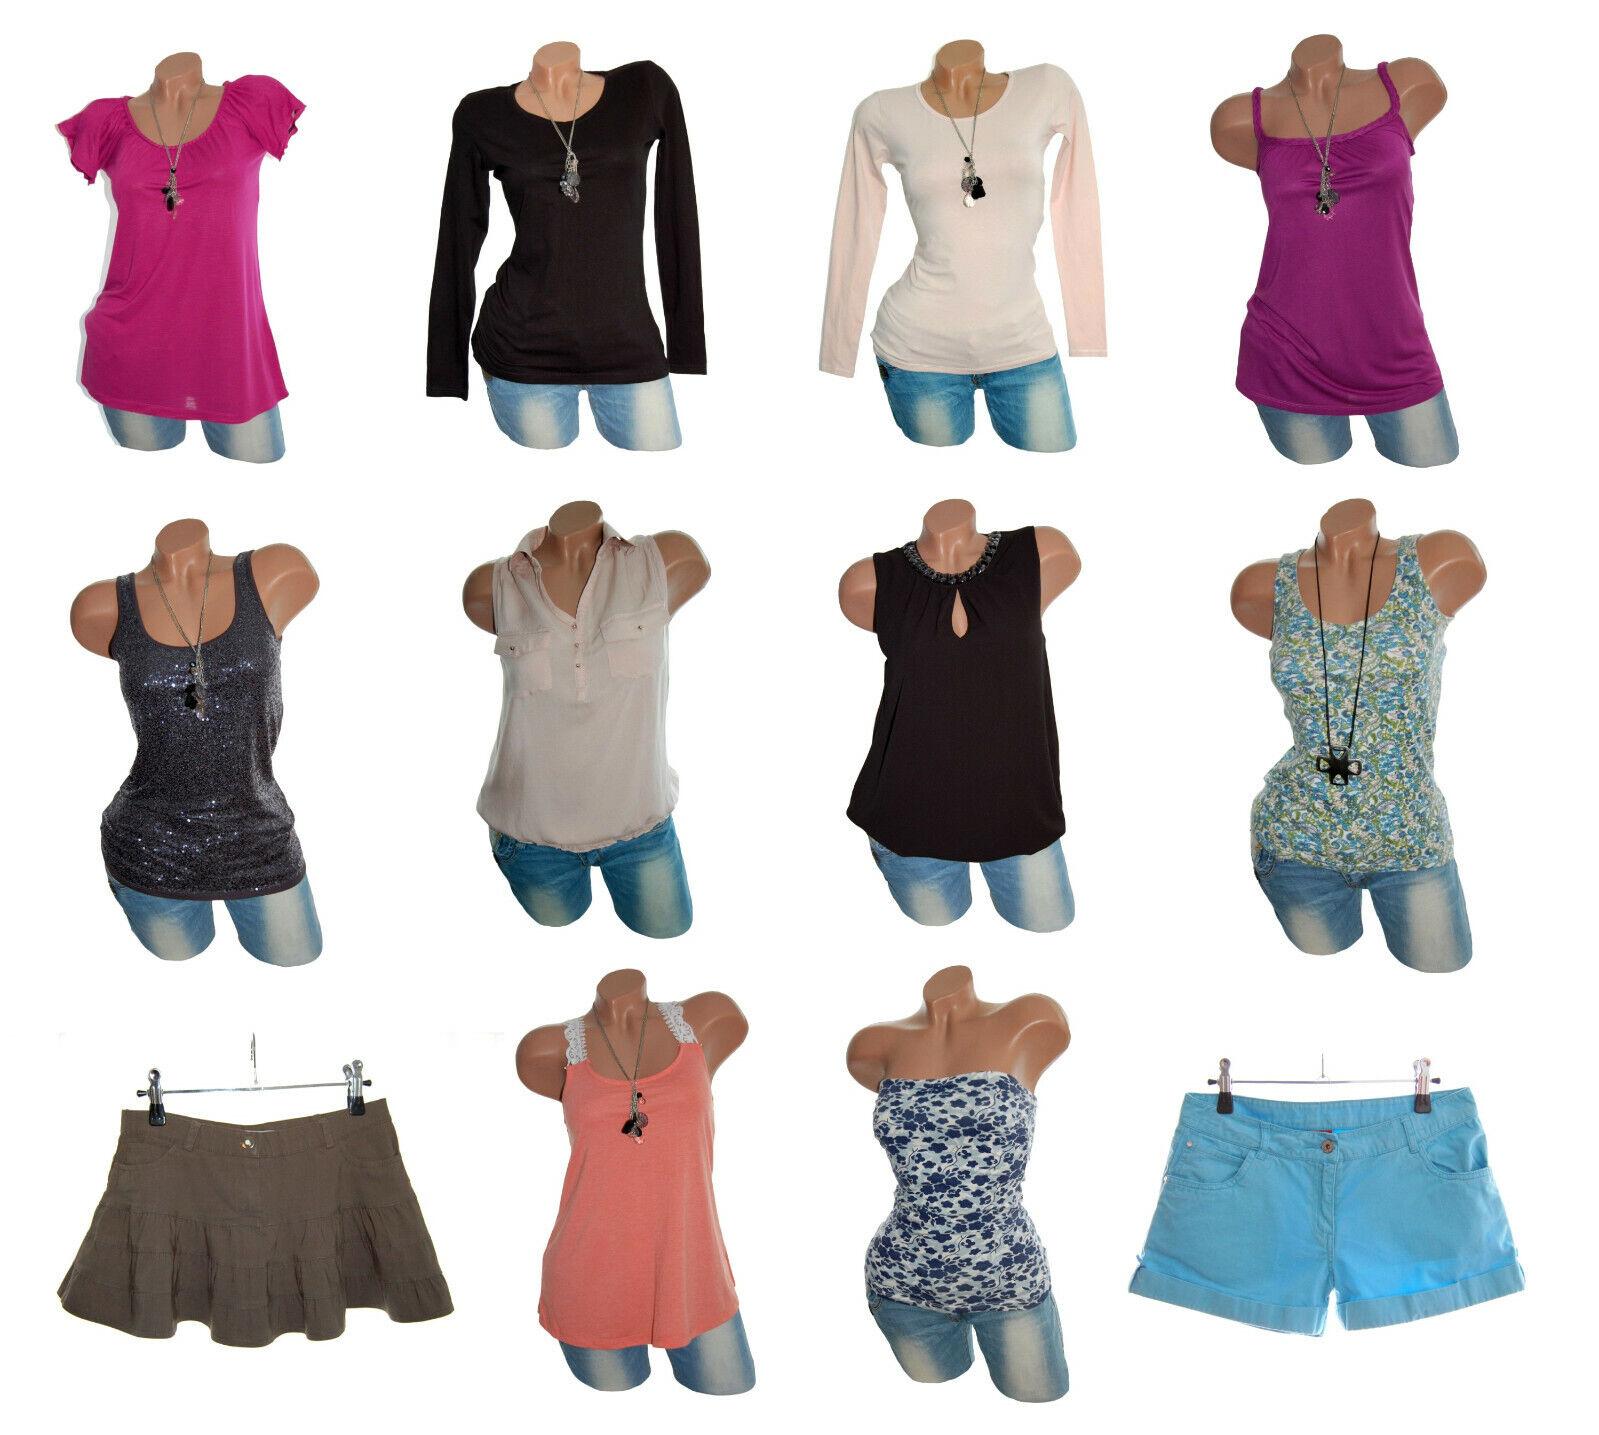 12 Teile Bekleidungspaket Paket Kleidung Damen Gr. XS / S 32 / 34